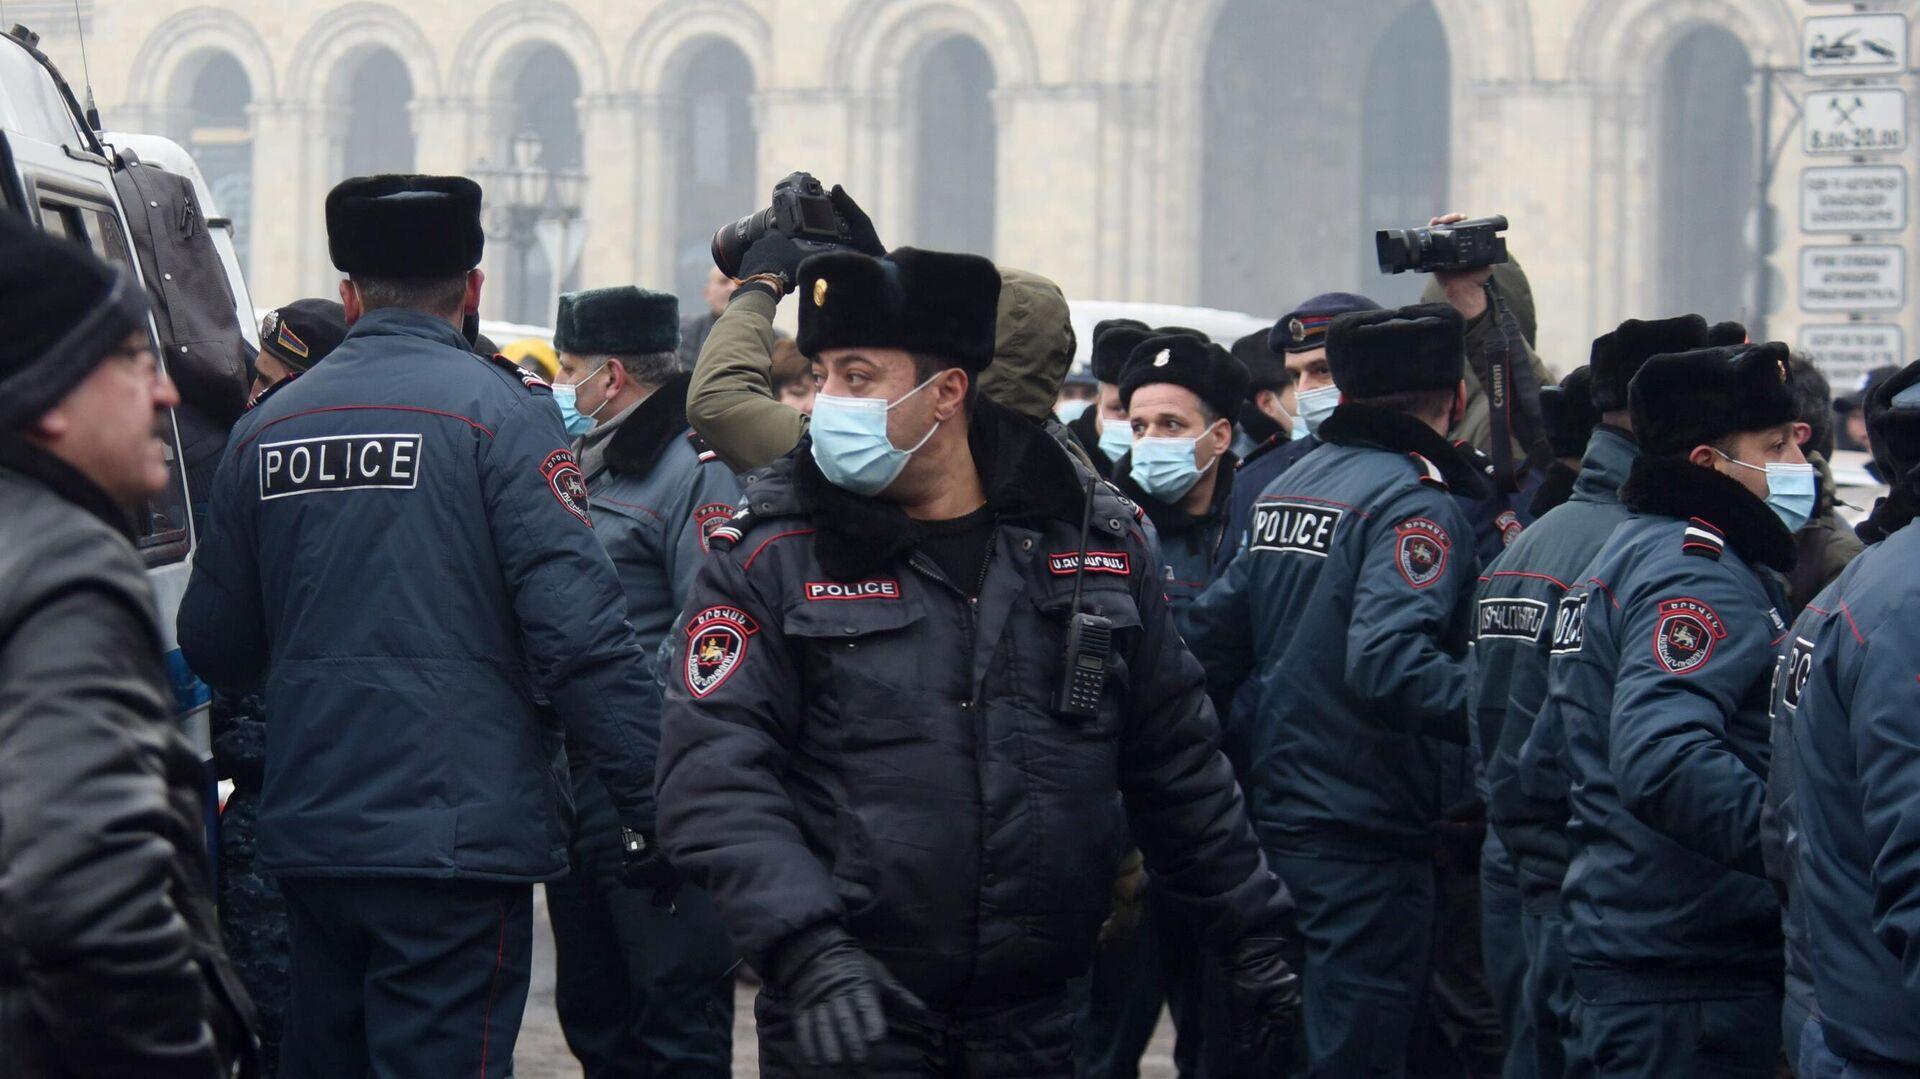 Сотрудники полиции во время акции протеста в Ереване - РИА Новости, 1920, 01.03.2021